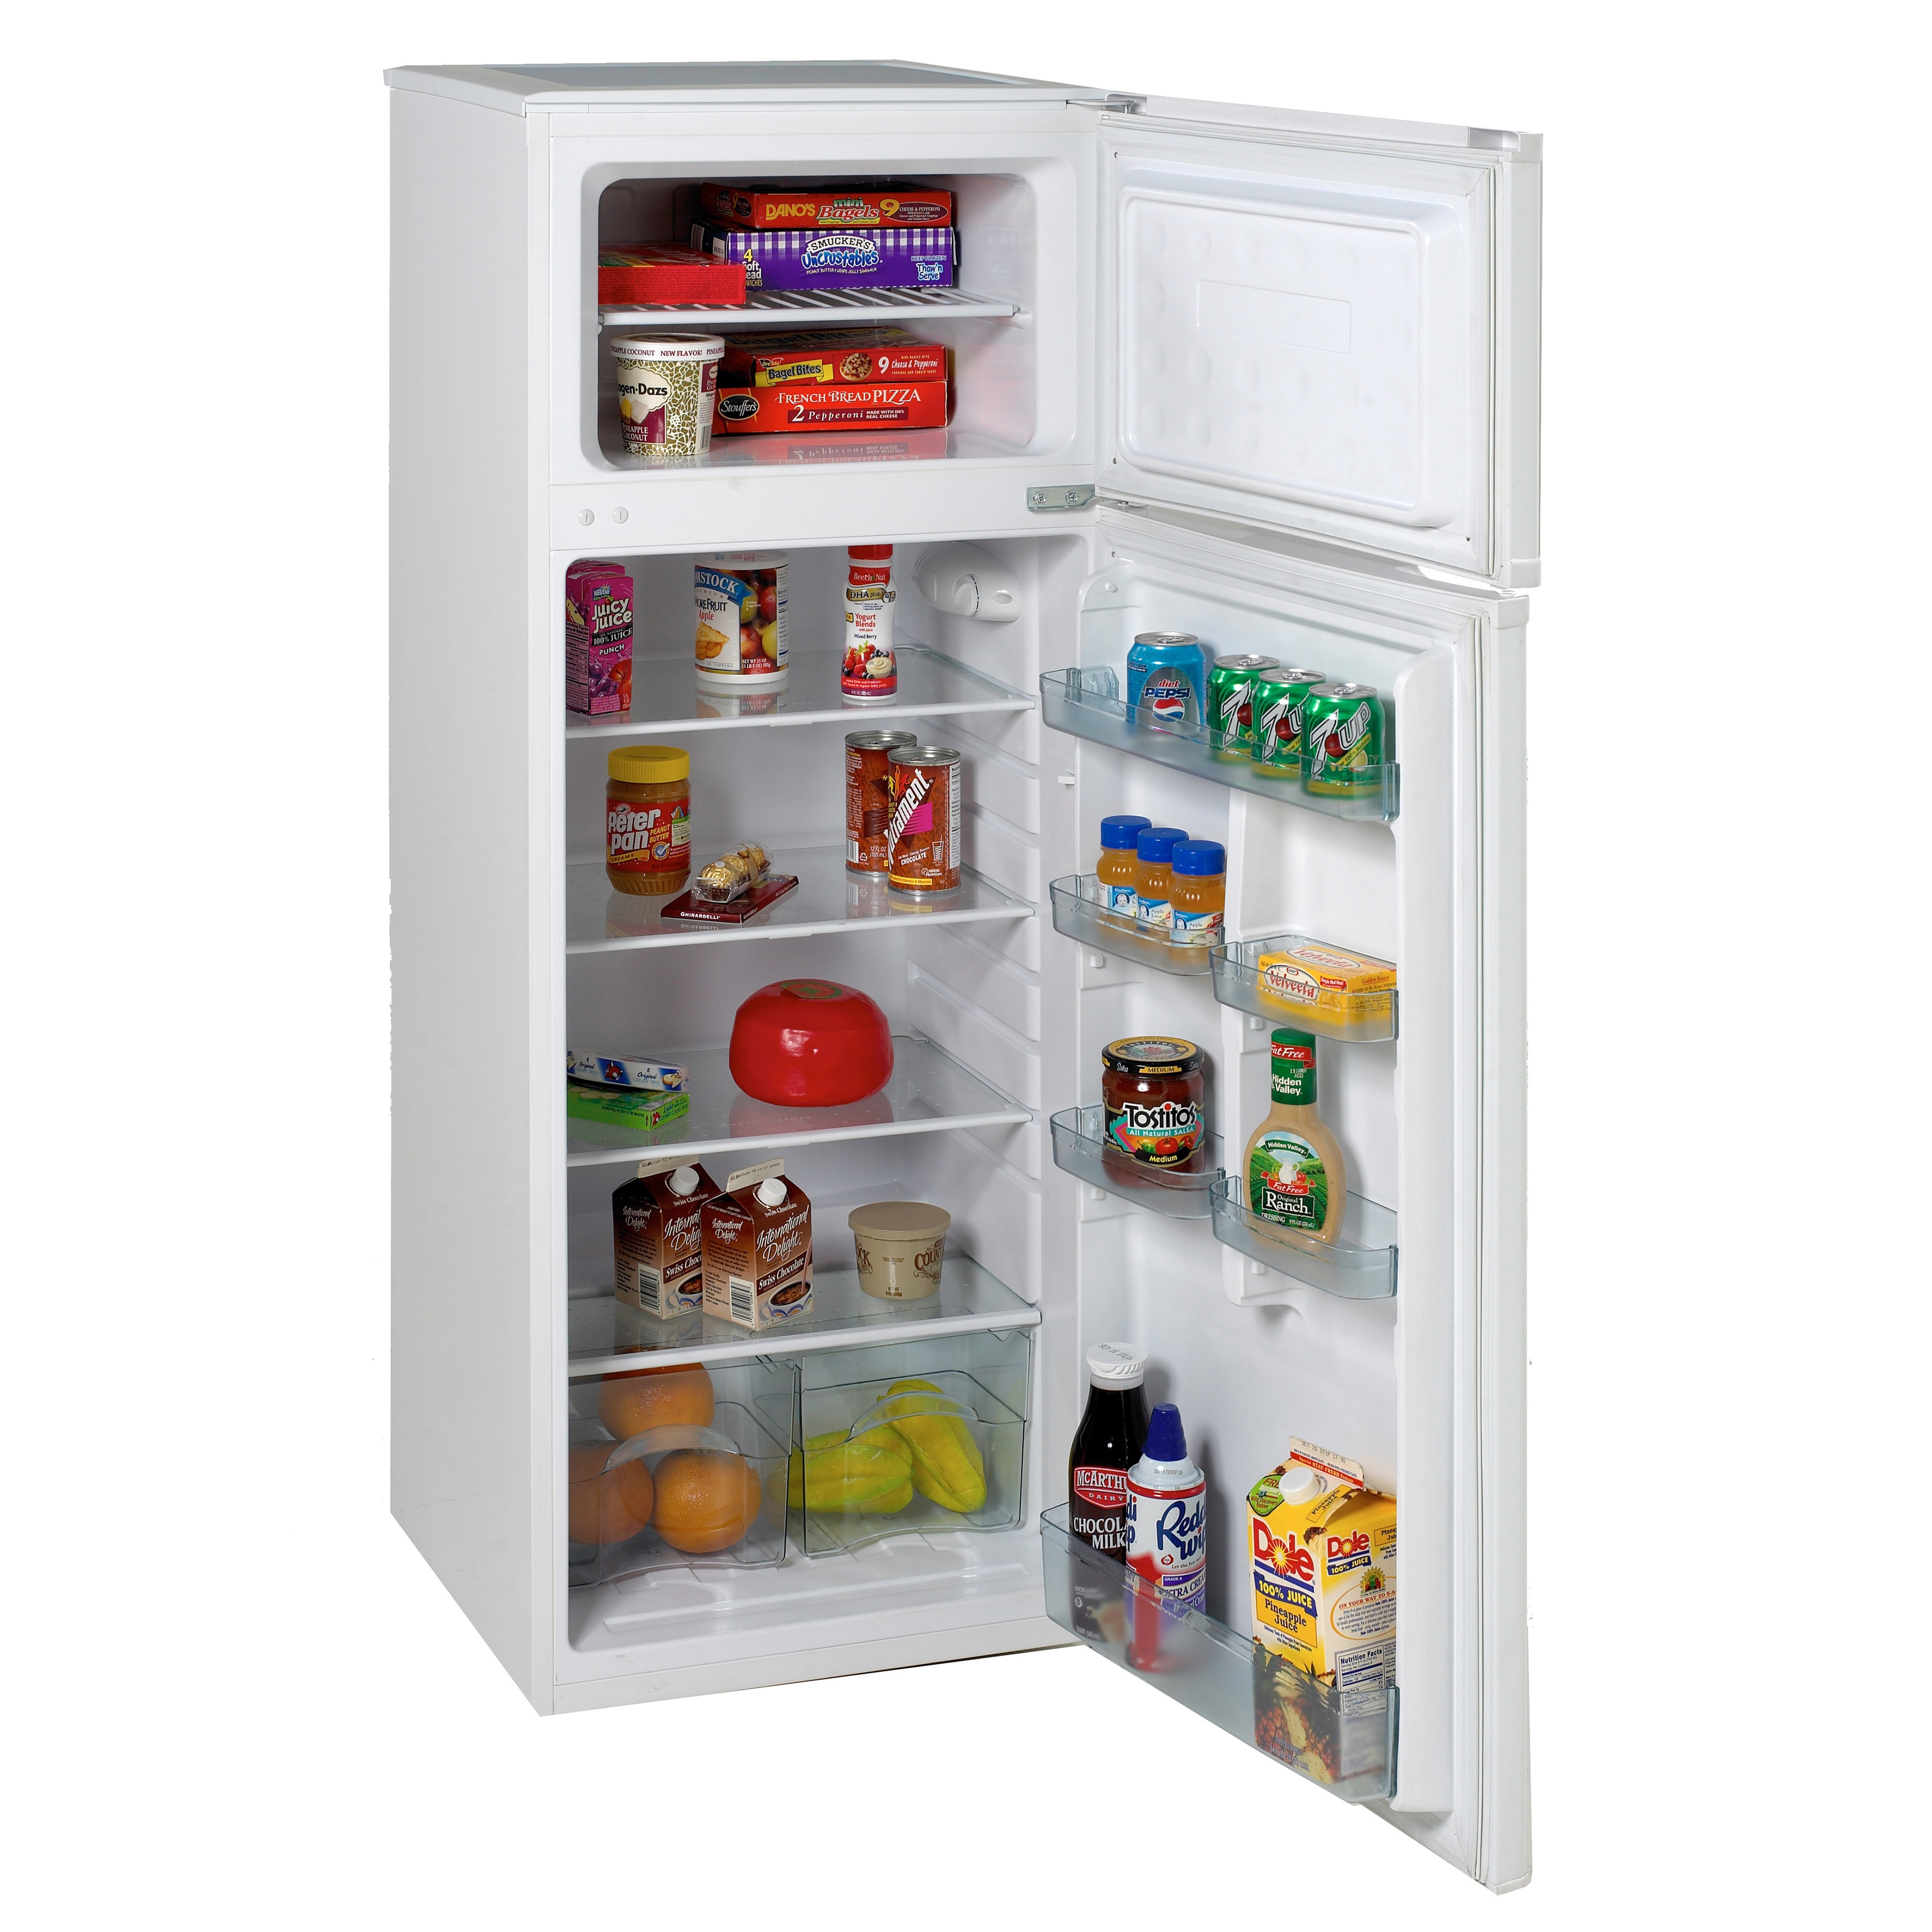 Lg apartment size refrigerator   Refrigerators   Compare Prices at ...